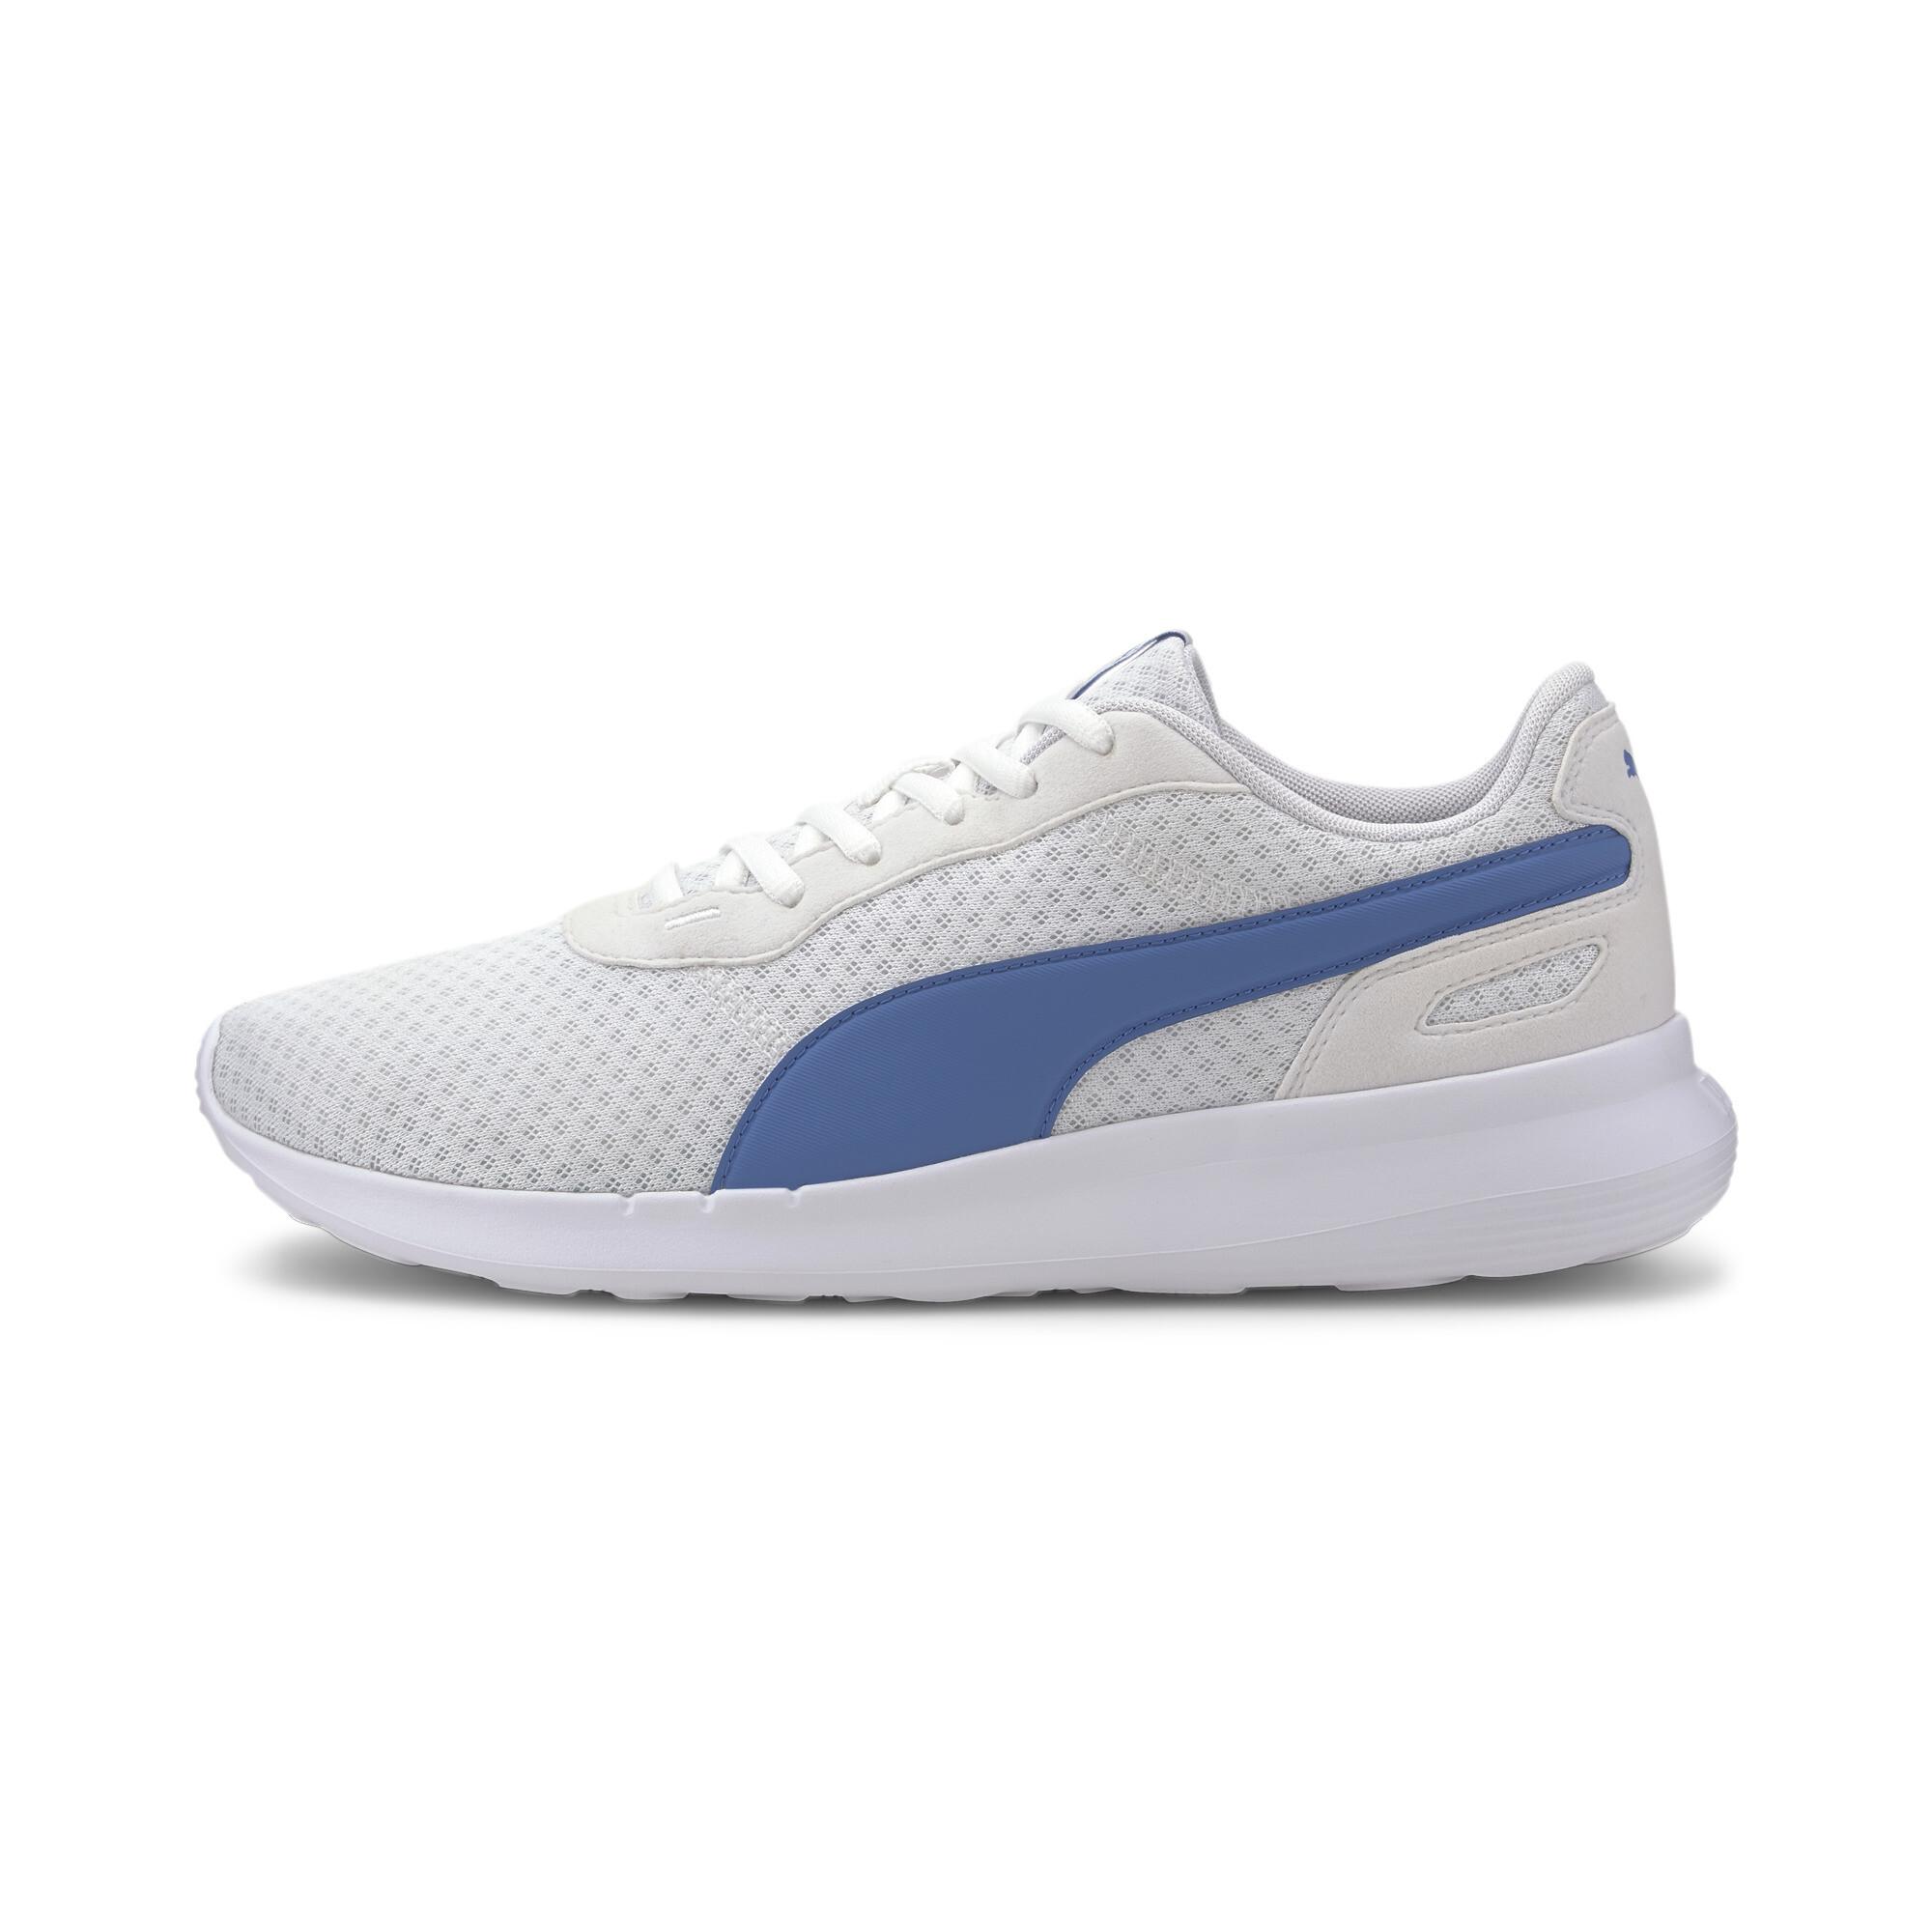 PUMA-Men-039-s-ST-Activate-Sneakers thumbnail 26